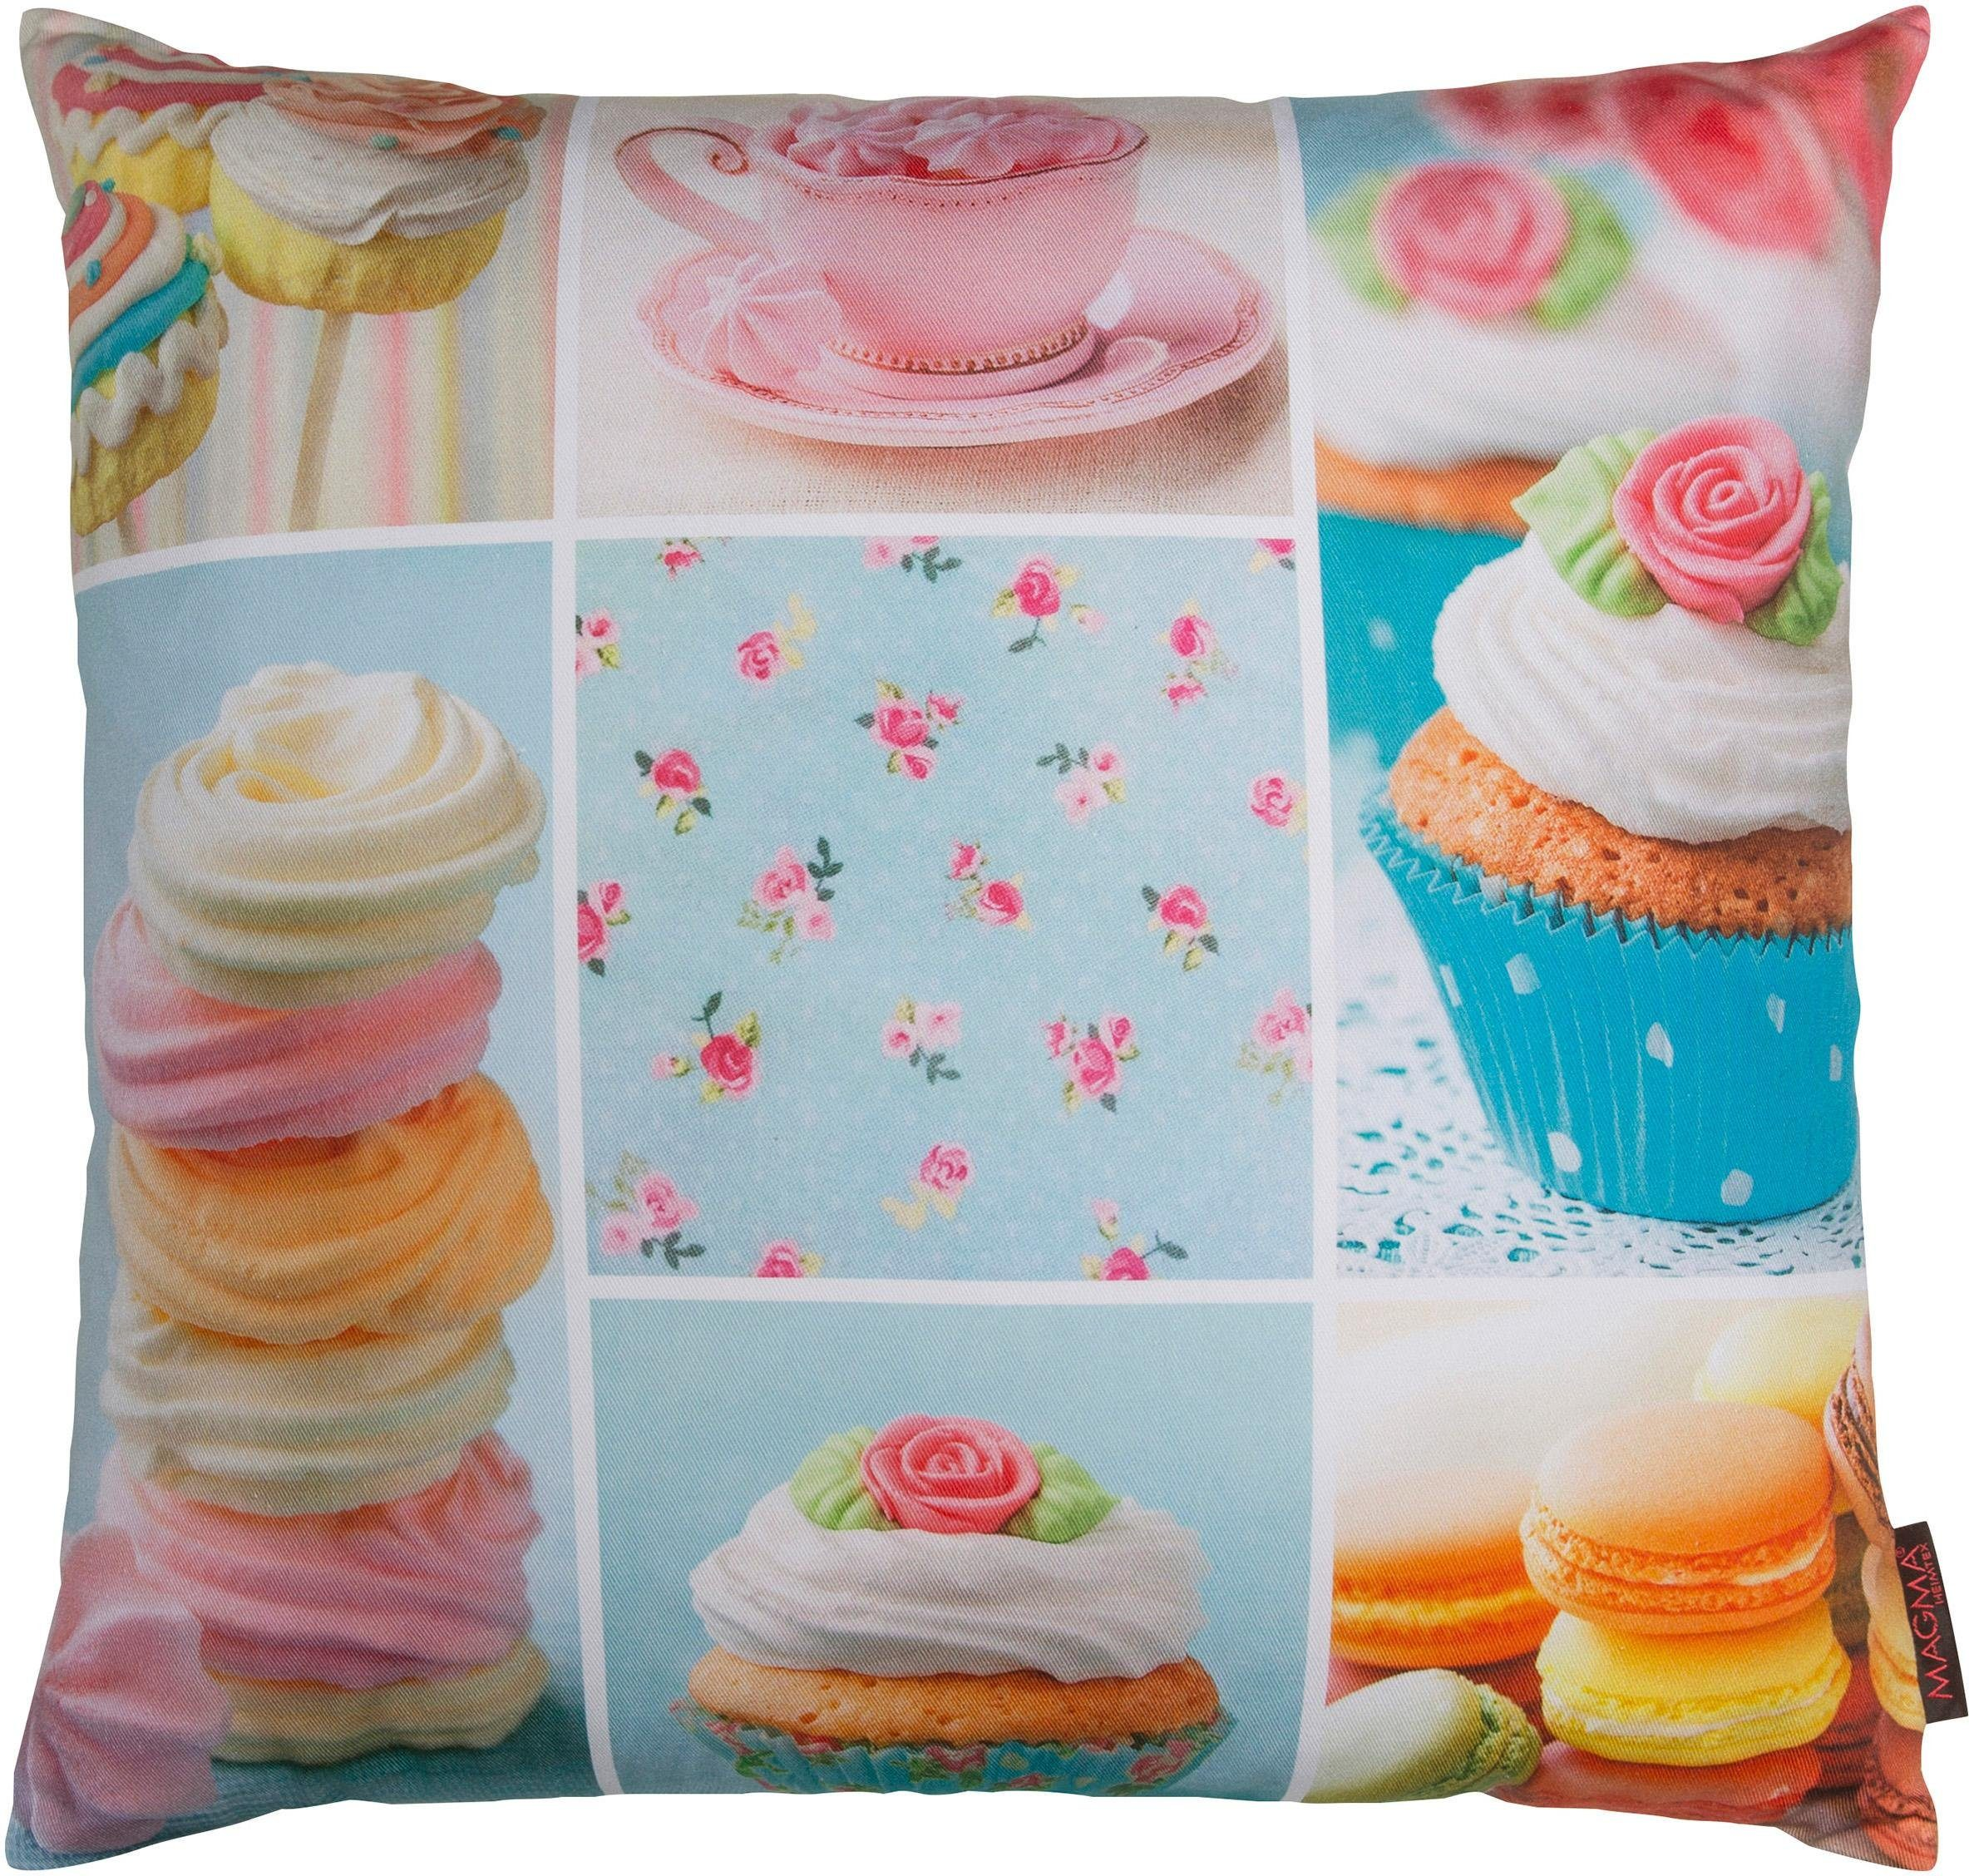 Kissenbezug, Magma, »Cupcake Patchwork«, mit Cupcakes verziert